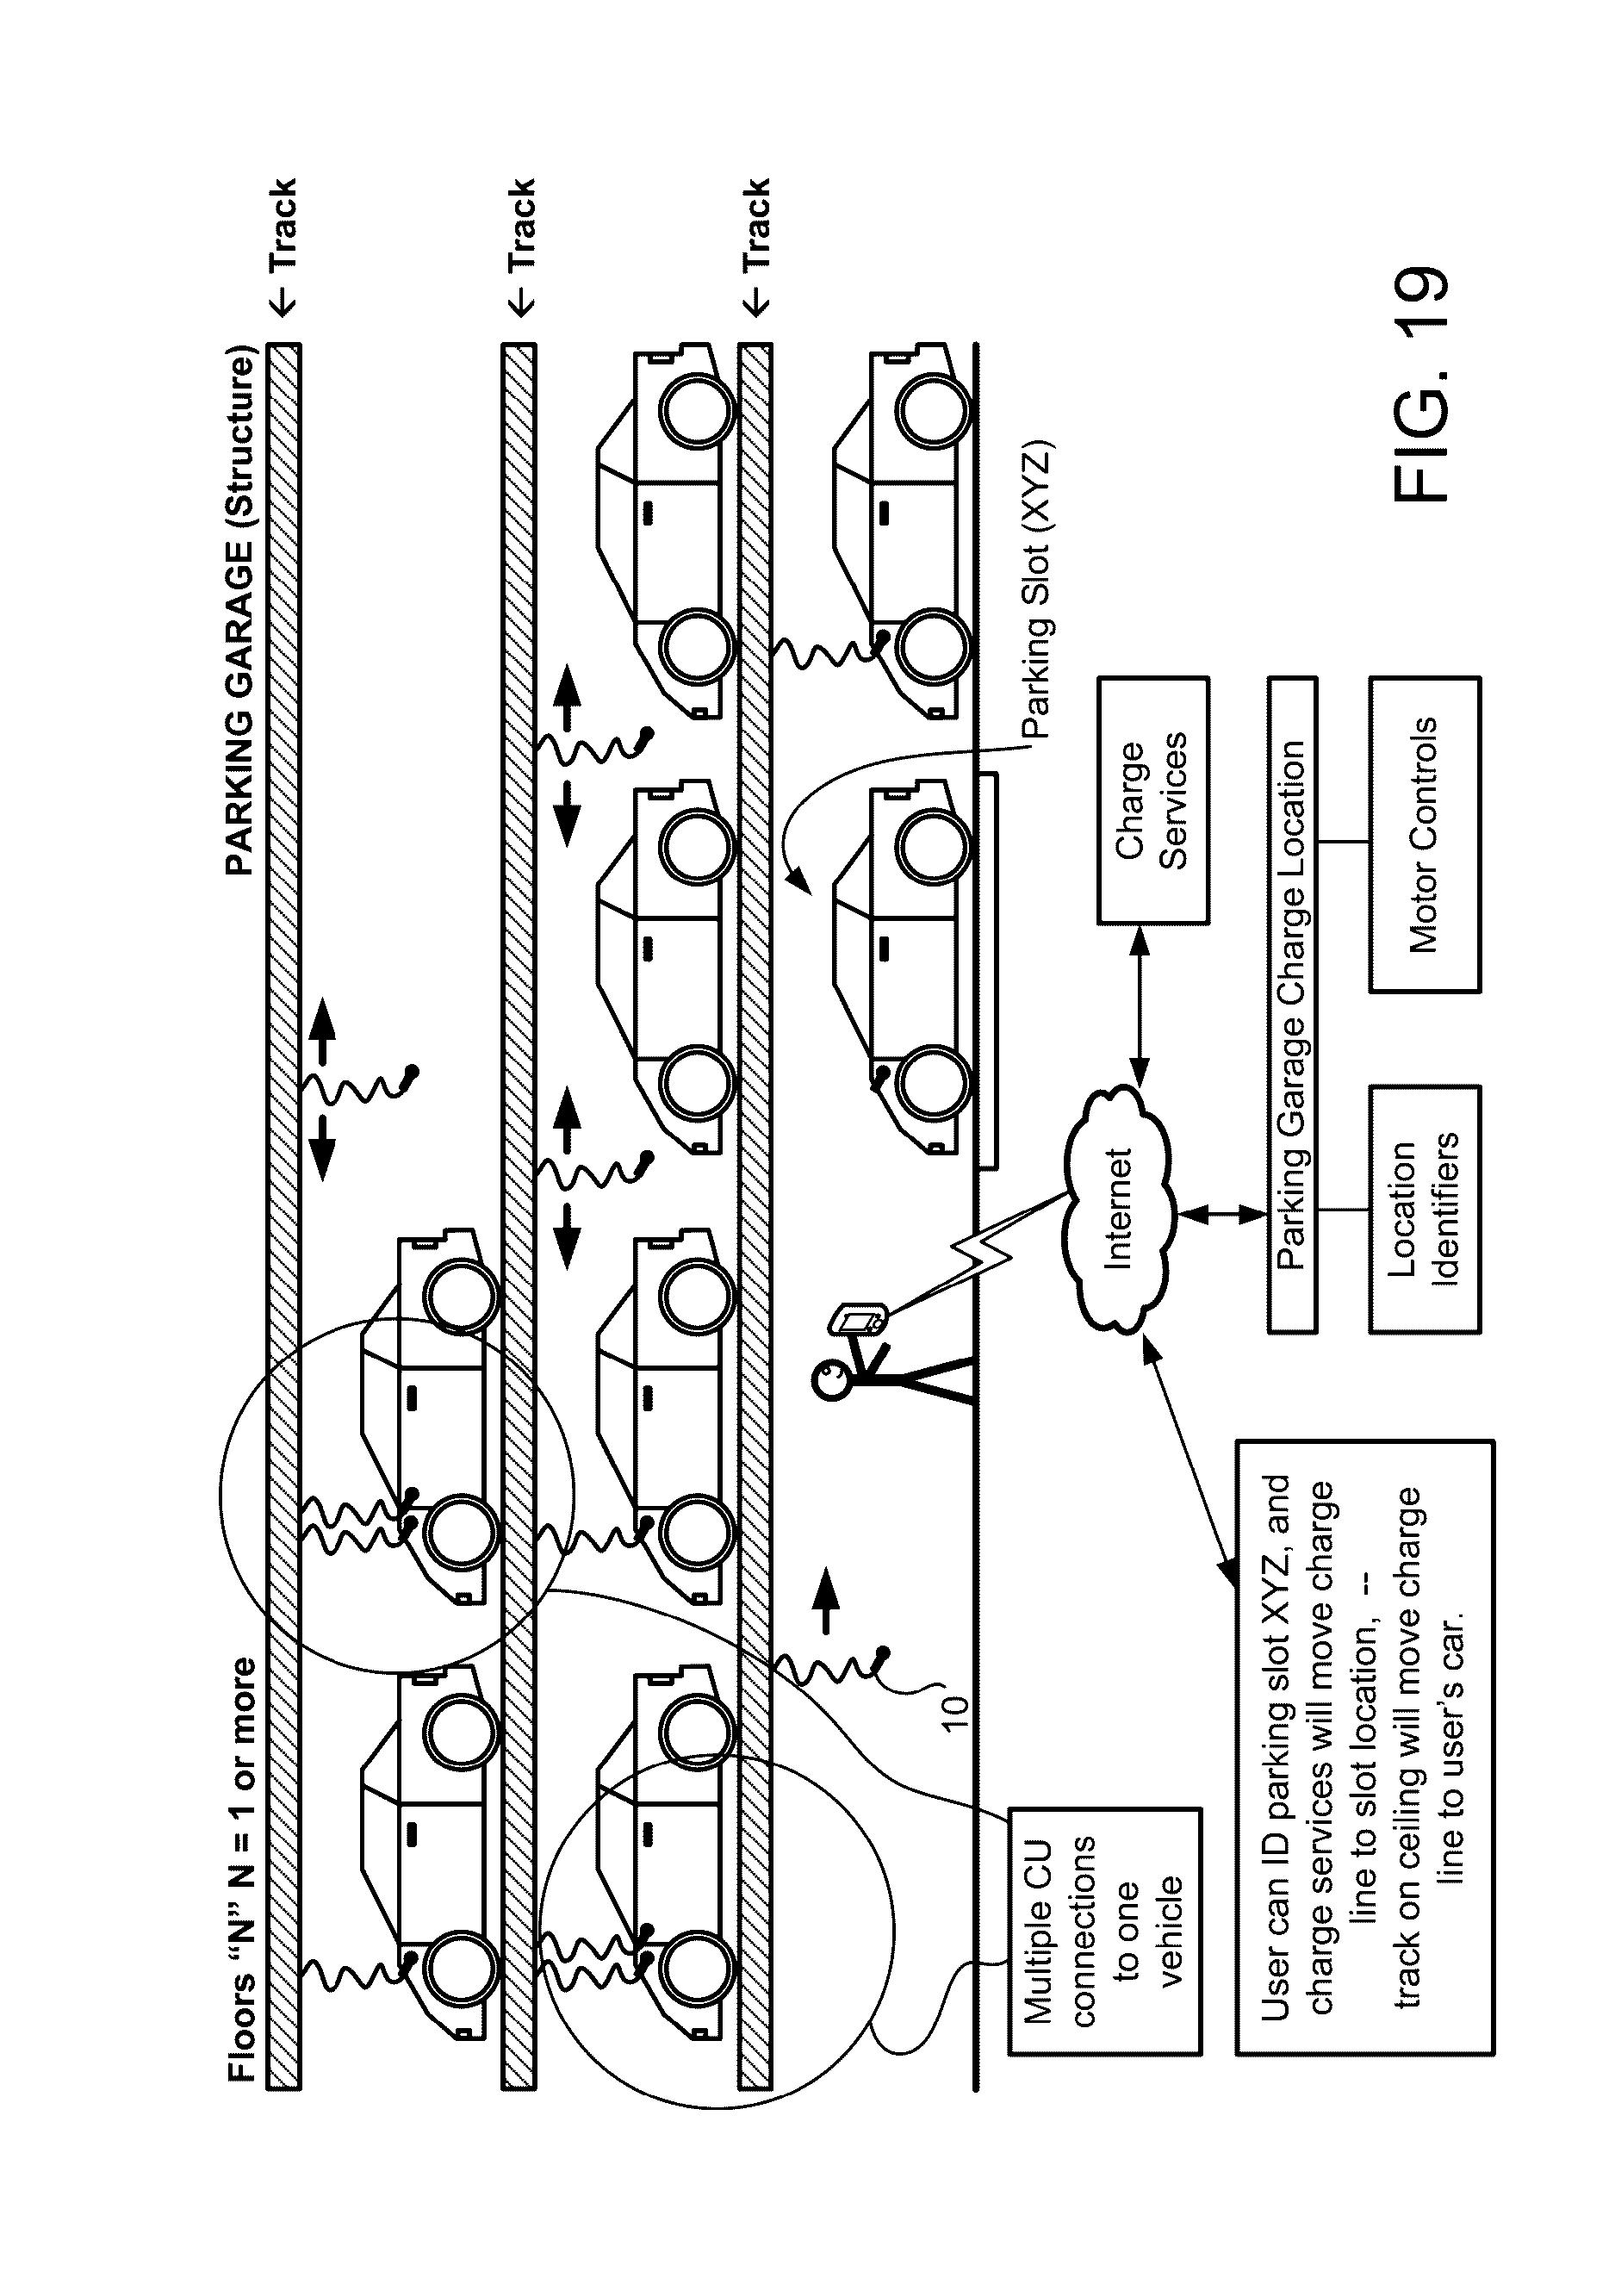 Patent US 9,545,853 B1